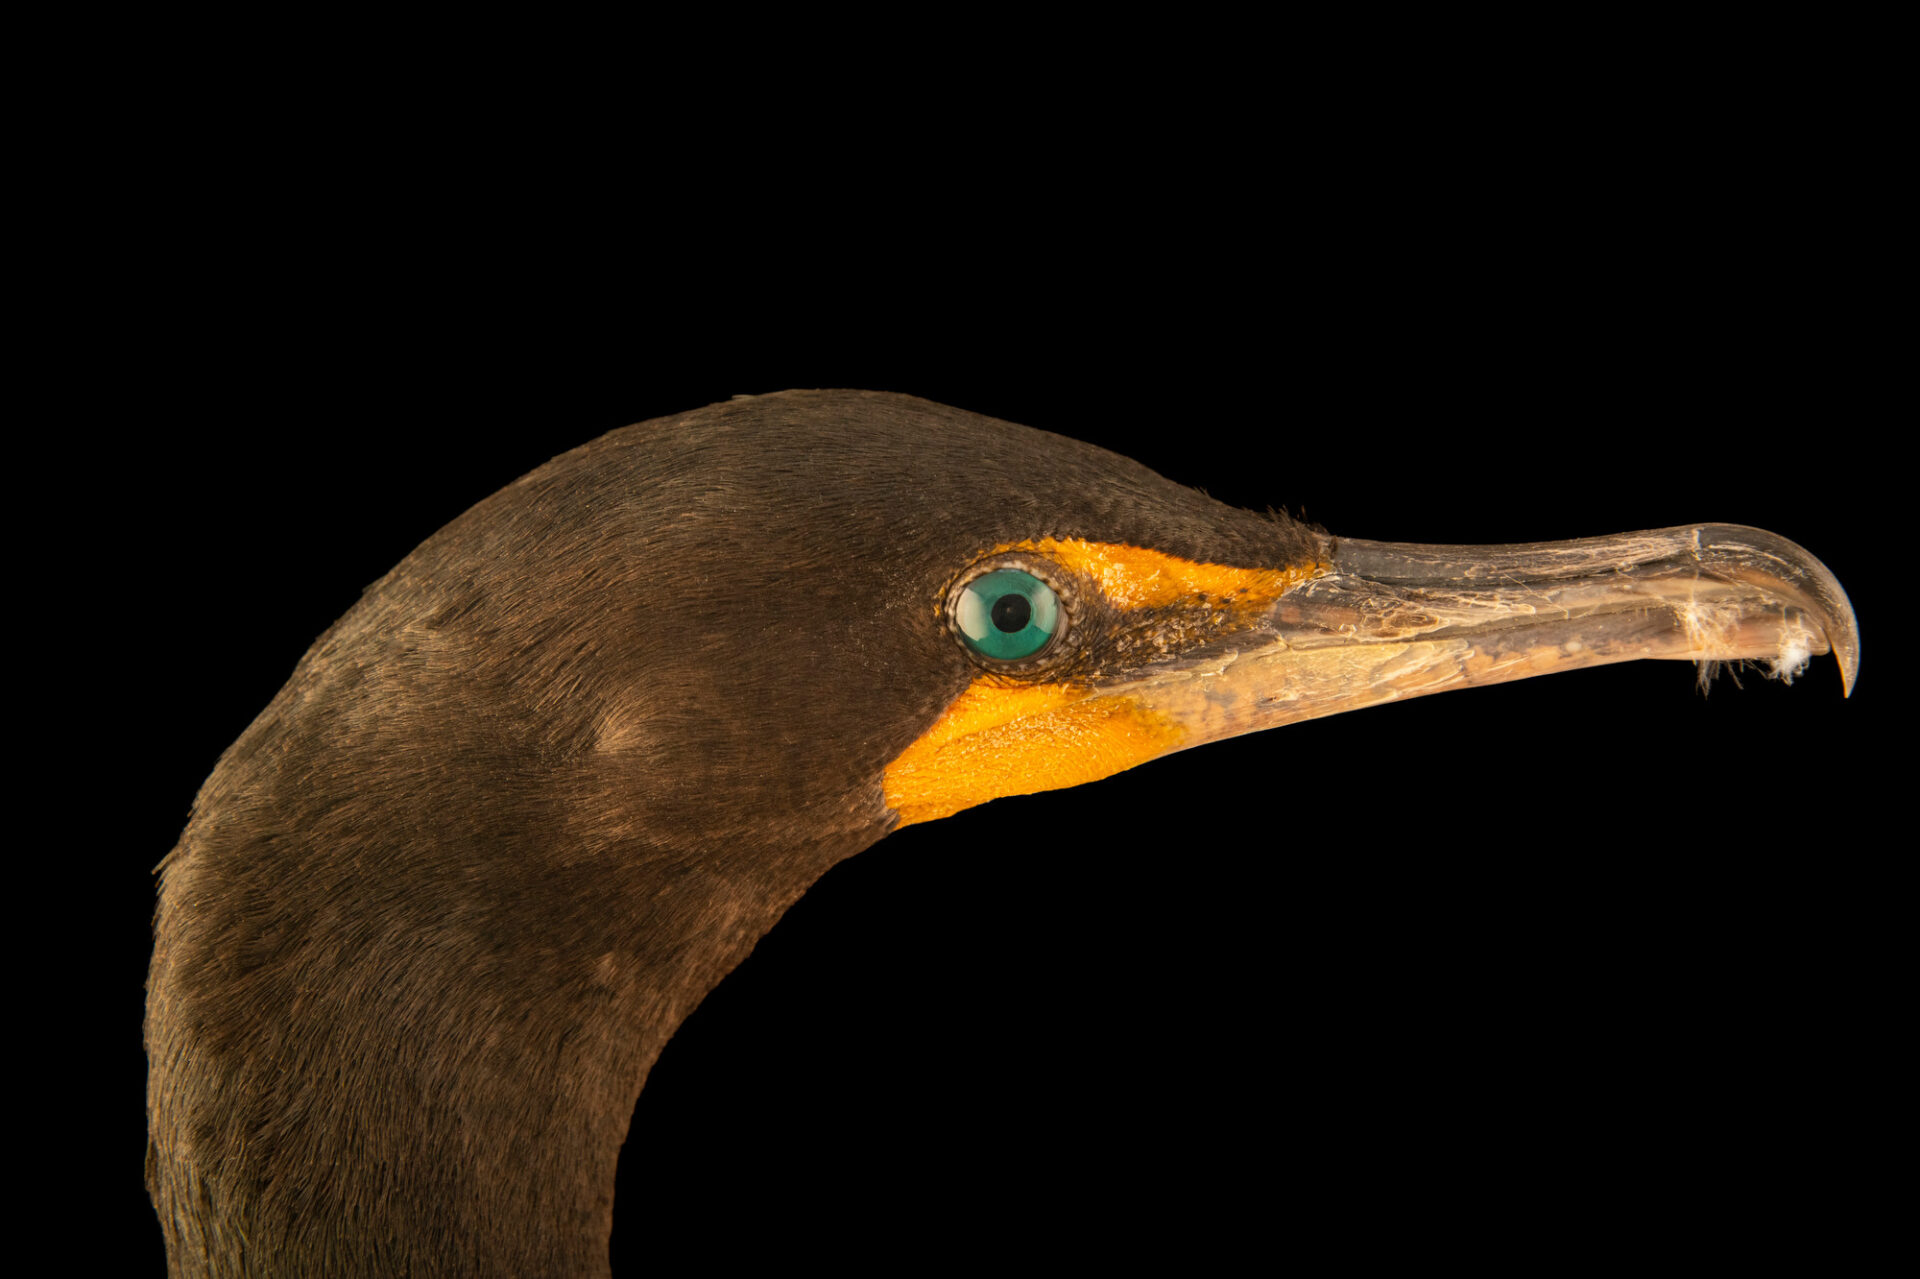 Photo: A Florida cormorant (Phalacrocorax auritus floriduanus) at the Jacksonville Zoo and Gardens, Jacksonville, Florida.